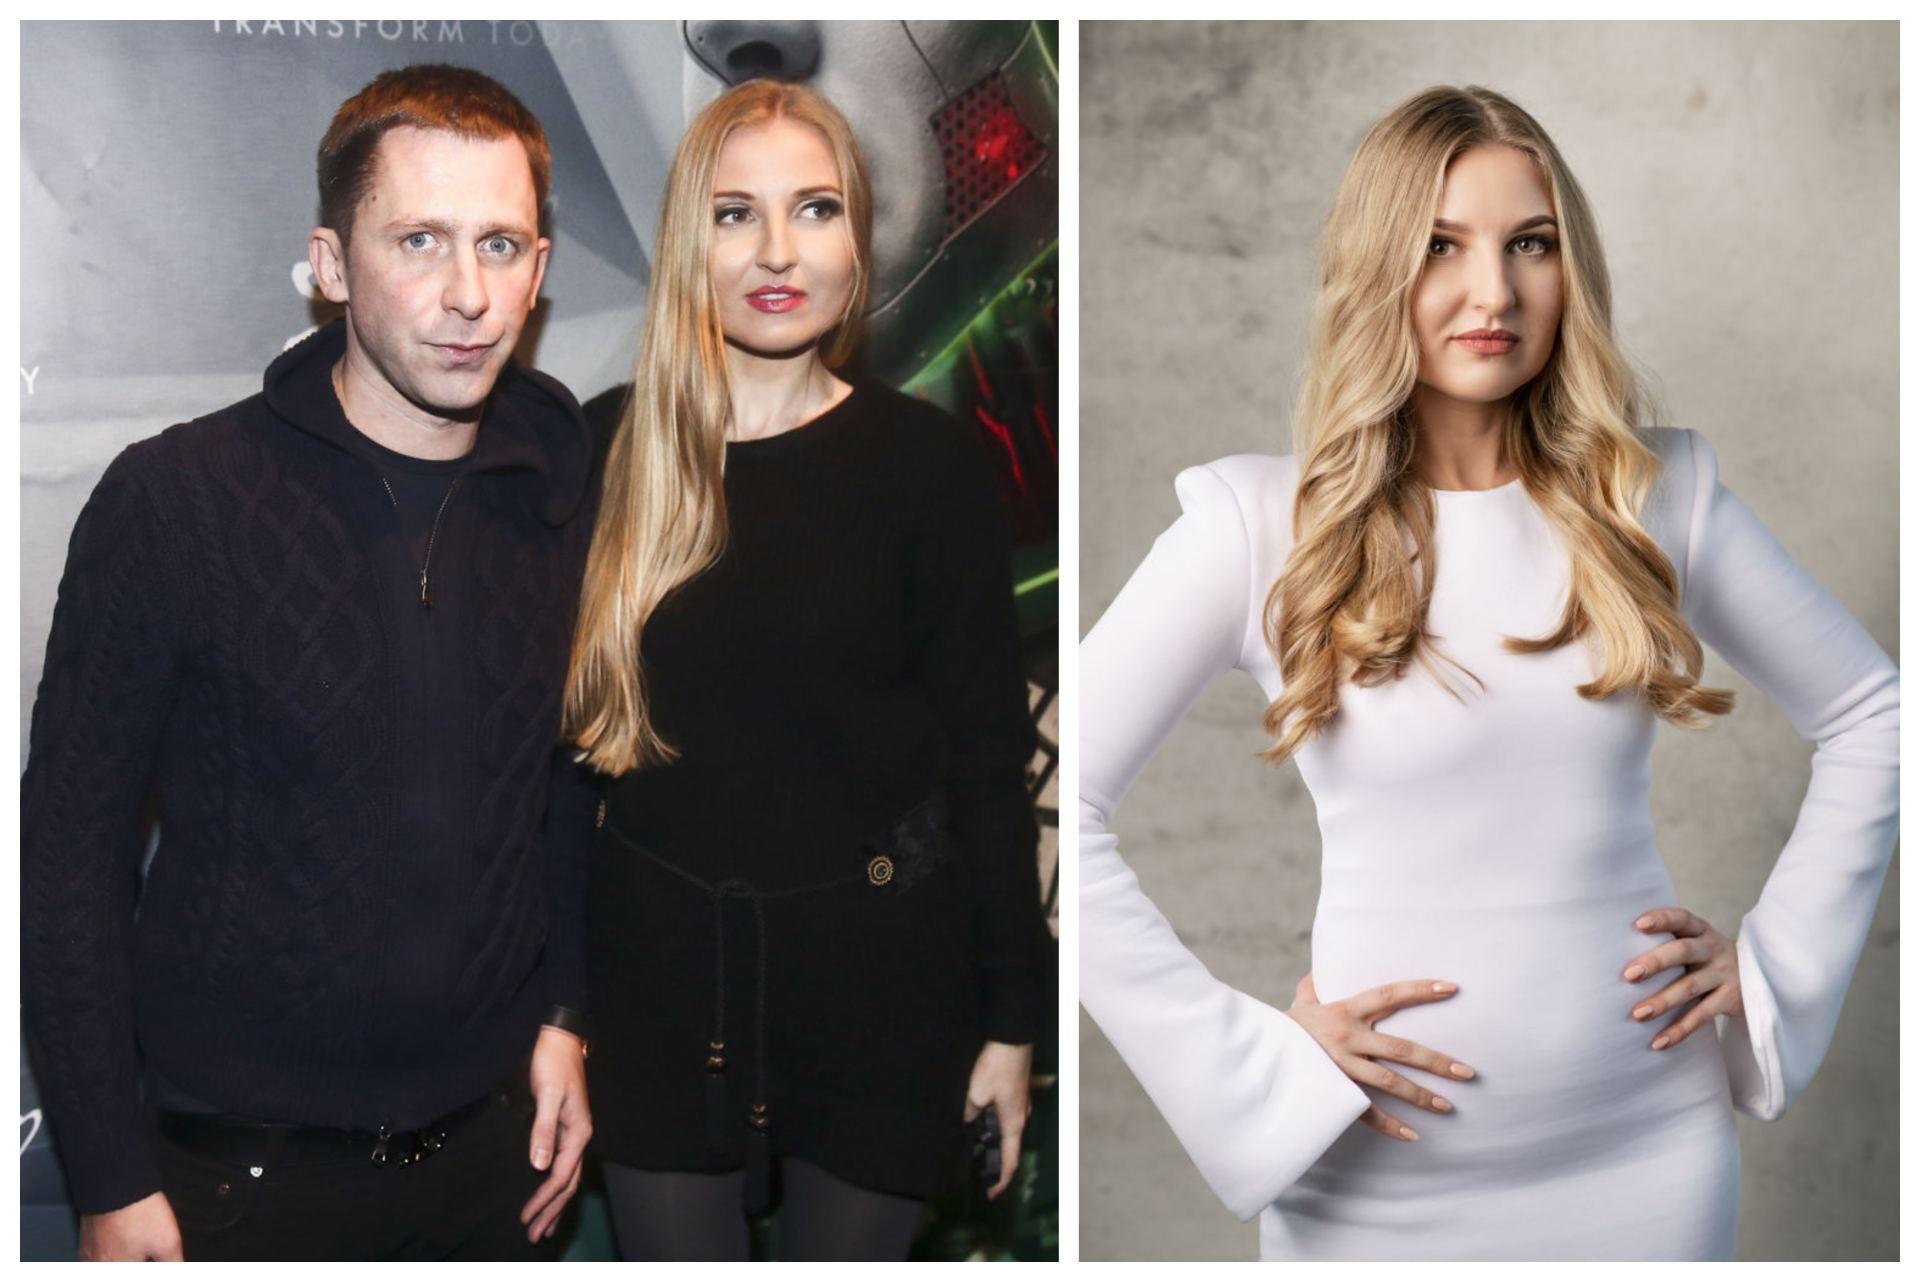 Po 2 Metų Tylos Itin Atviras Eleonoros Sebrovos Interviu